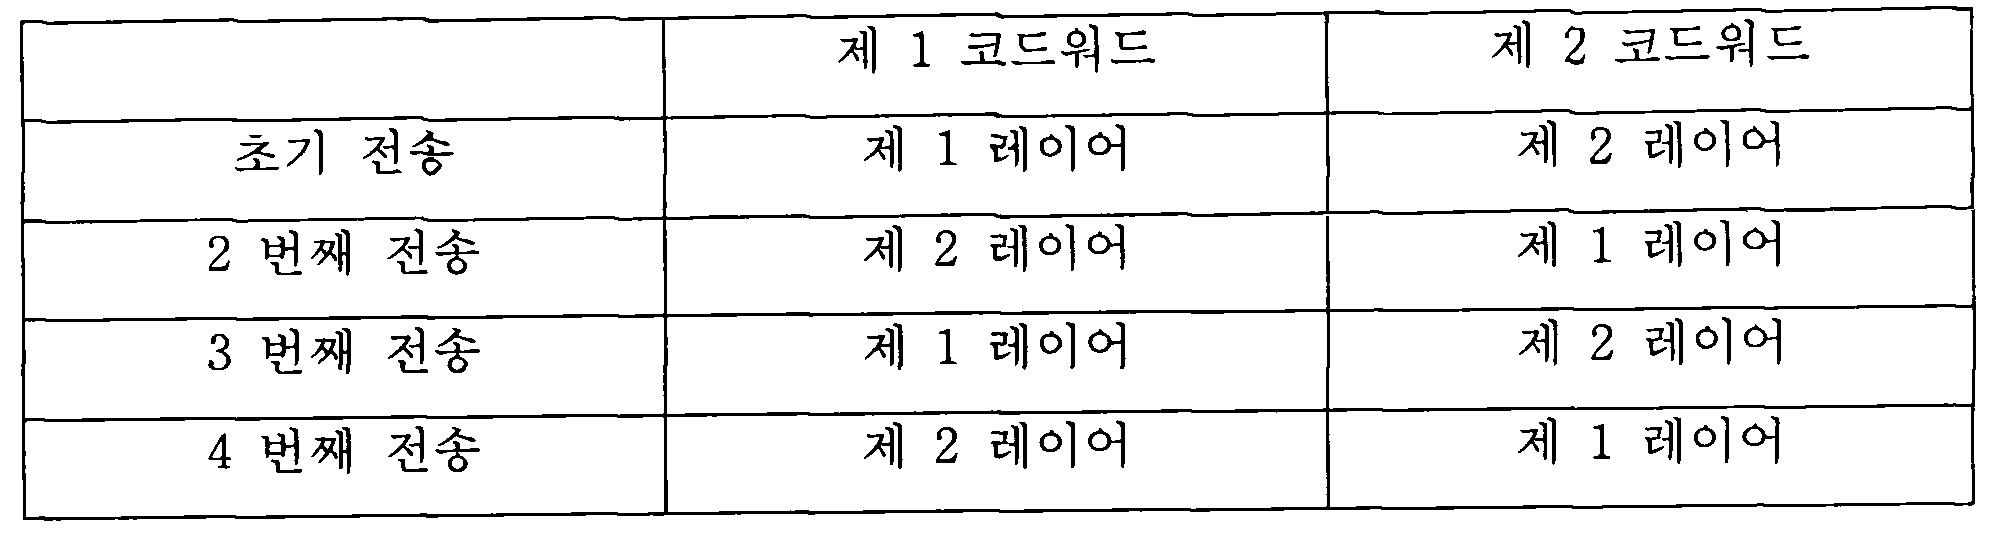 Figure 112011500920901-pat00161